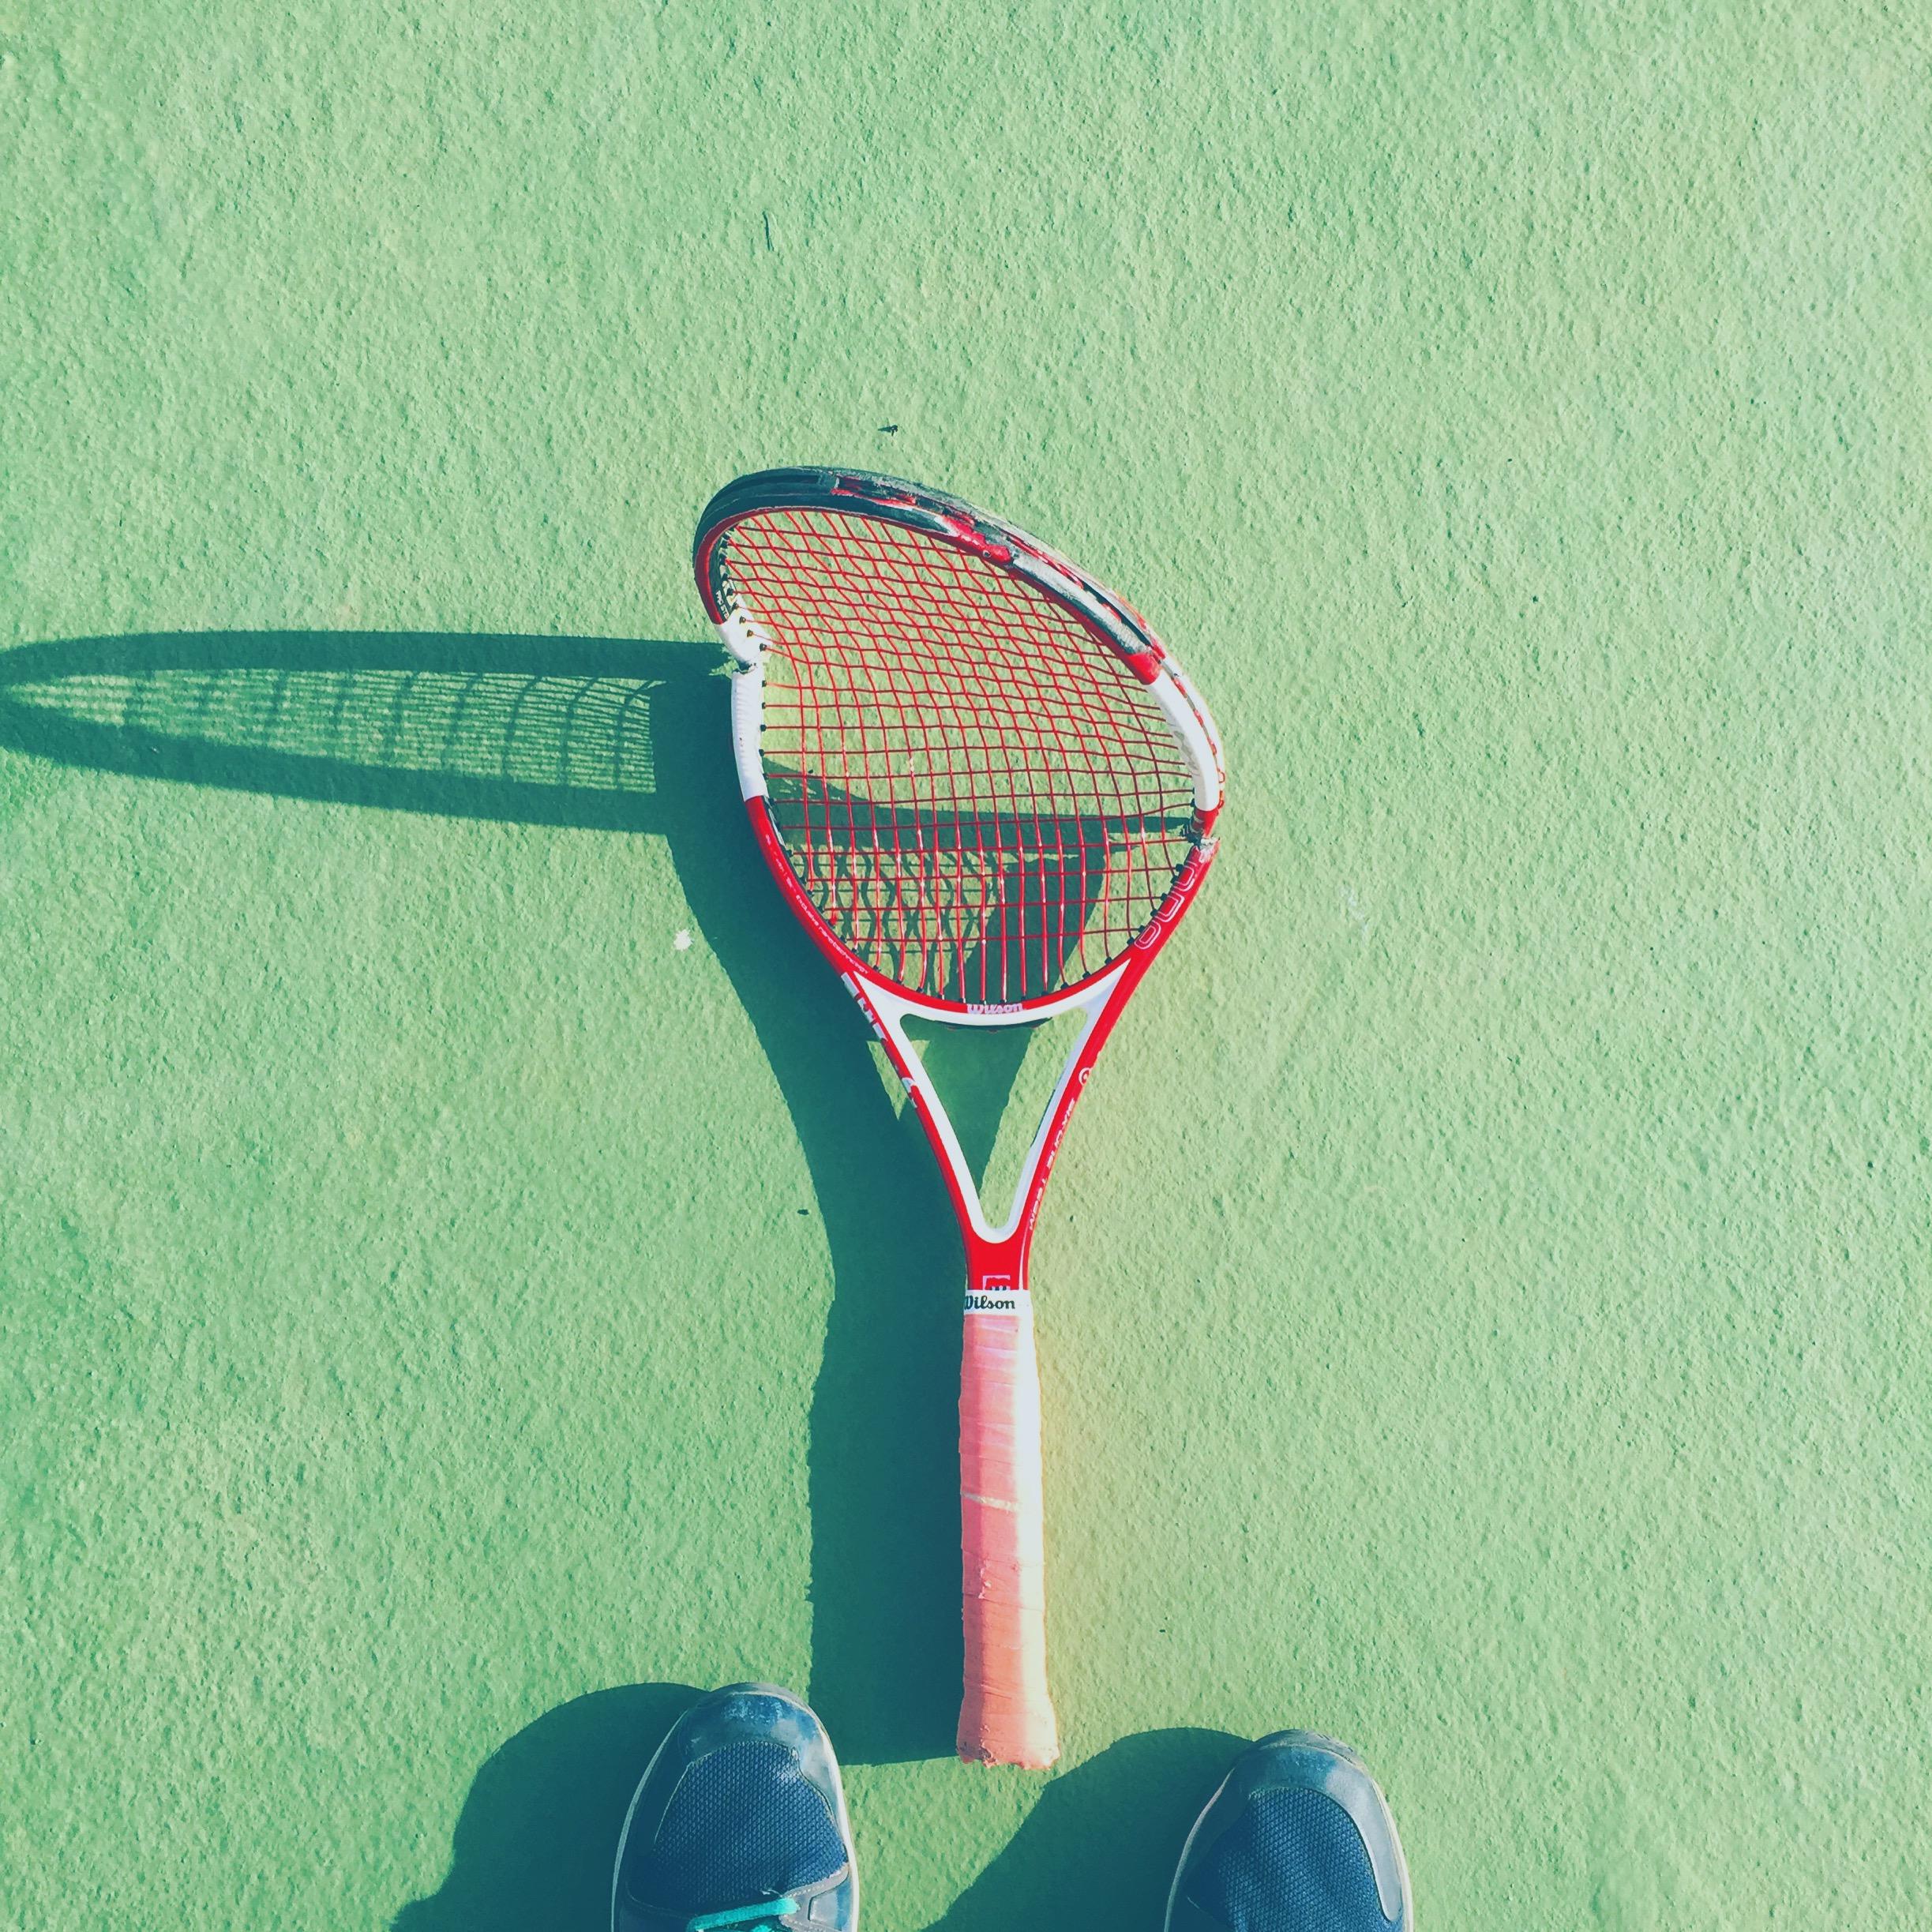 1 Racket Down